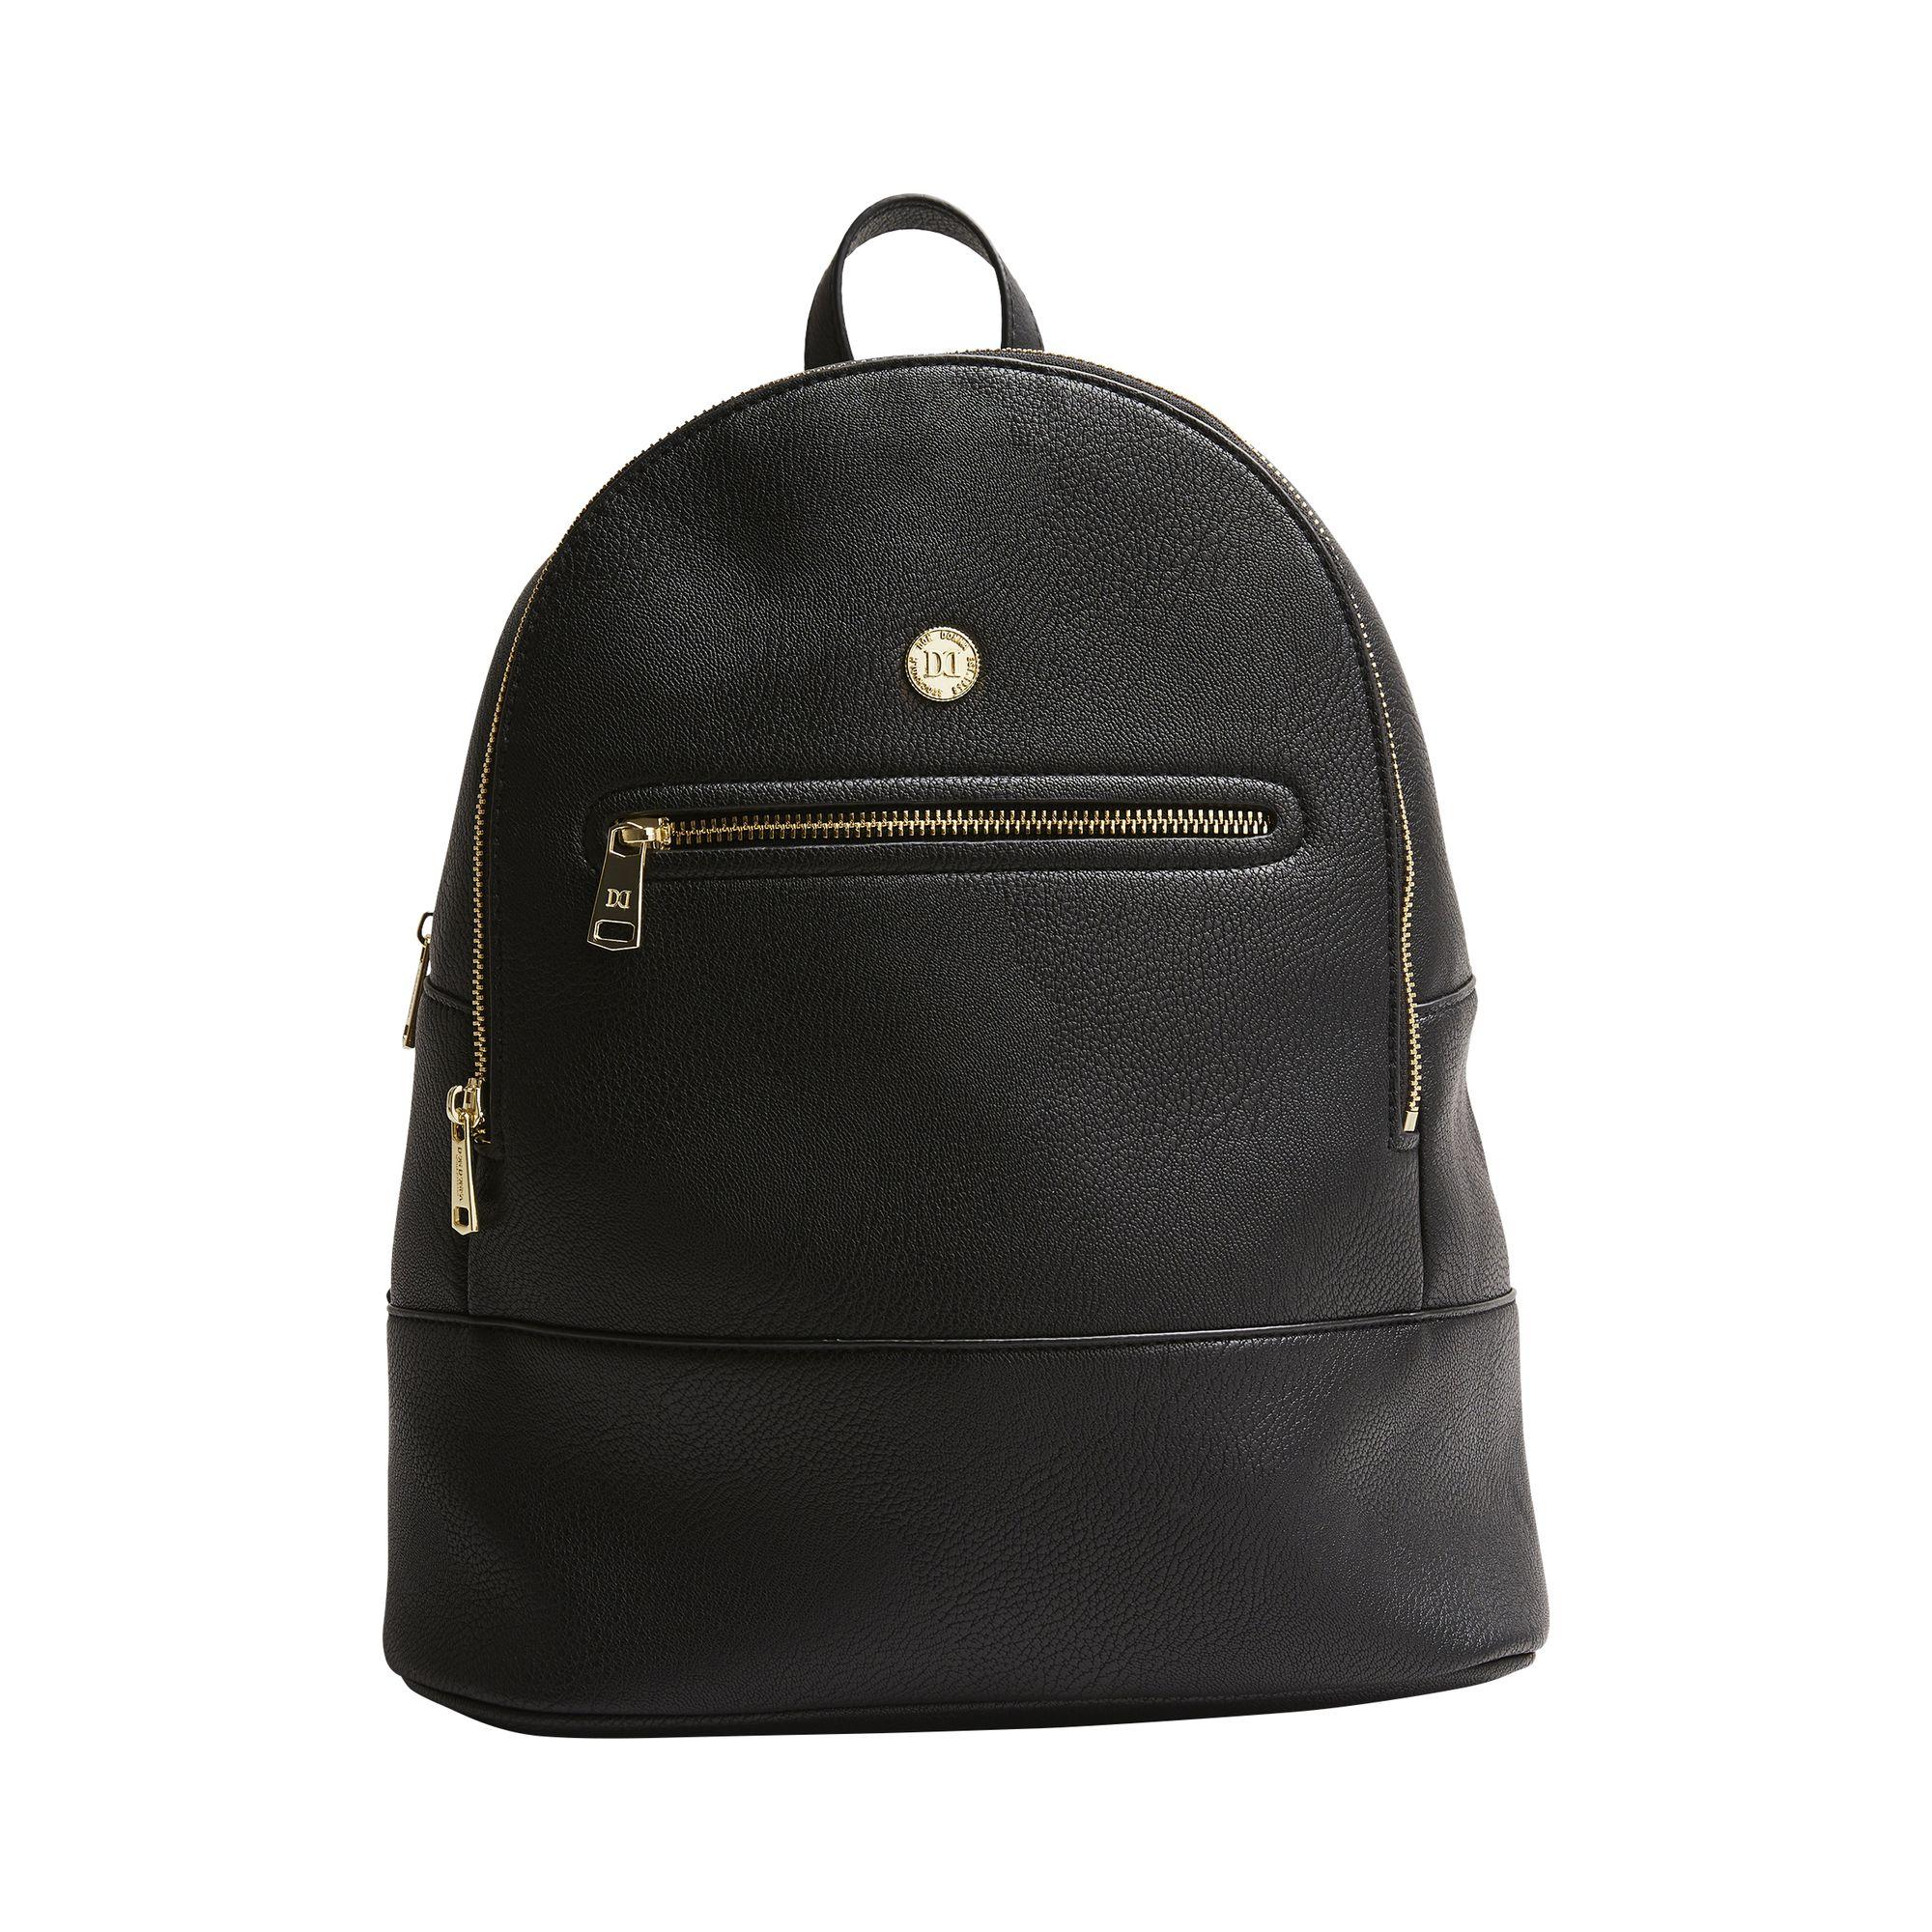 Handla online Don Donna Frida liten ryggsäck 82edec26a23c8